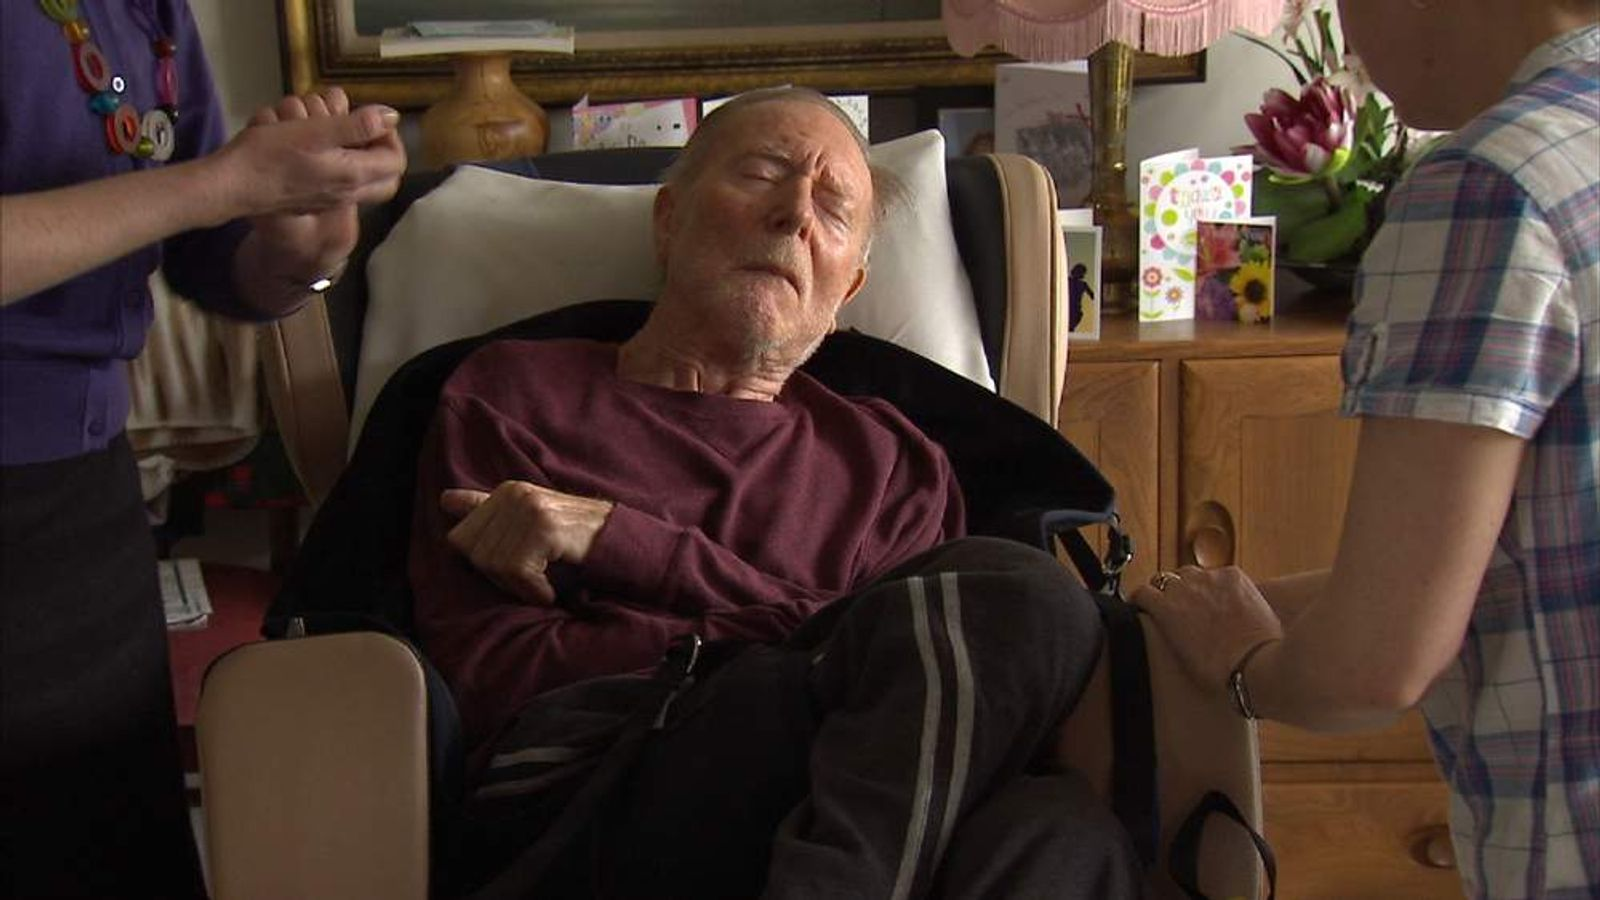 Dementia sufferer John Fenn